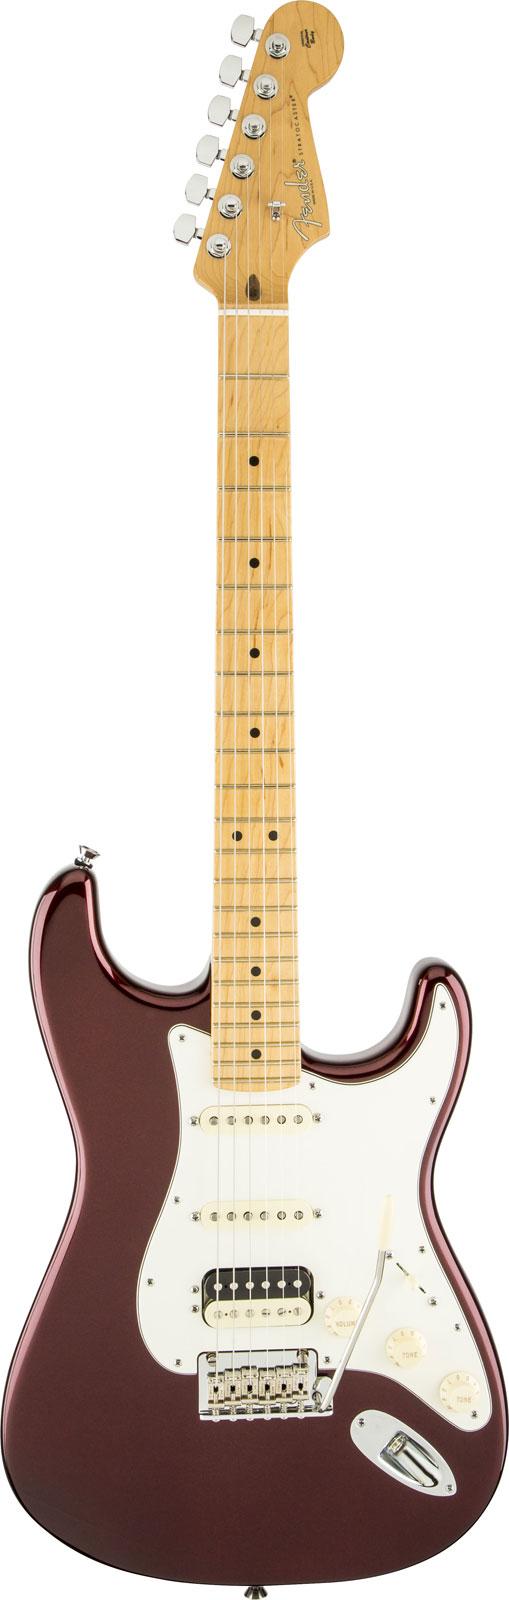 Fender American Standard Stratocaster Hss Shawbucker Mn Bordeaux Metallic + Etui